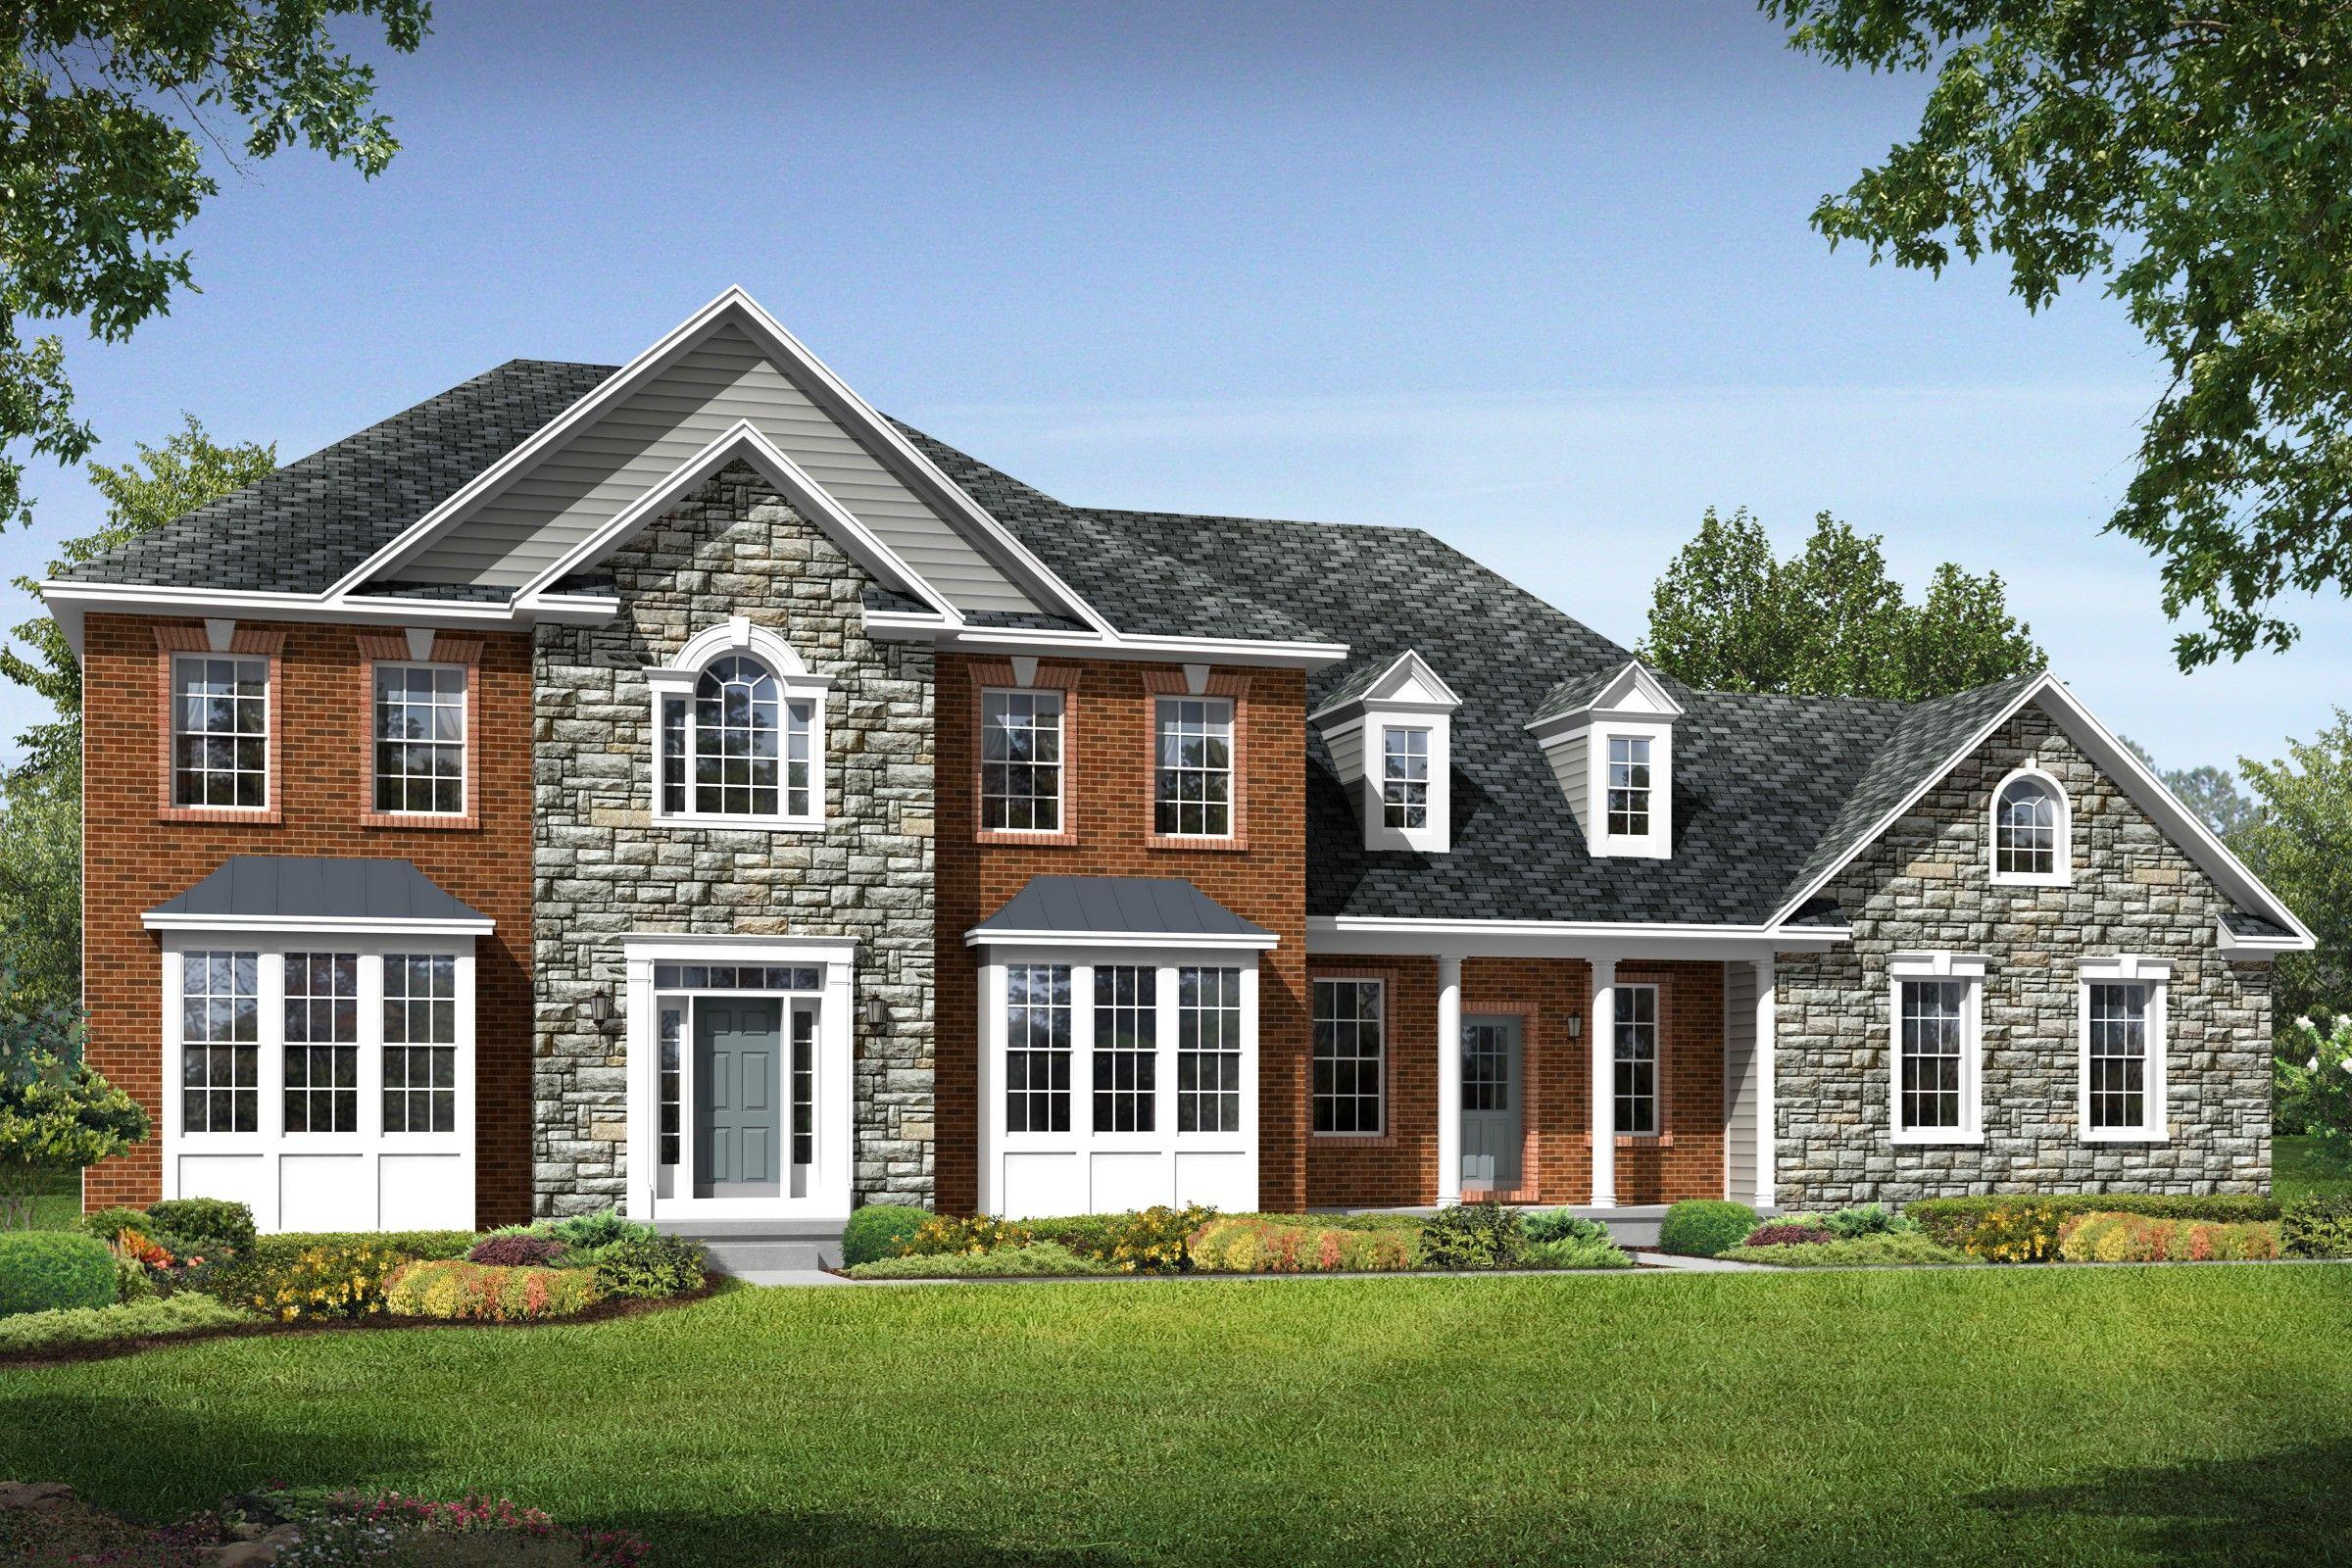 K hovnanian r homes reserves at wheatlands truman for Modern homes for sale in virginia